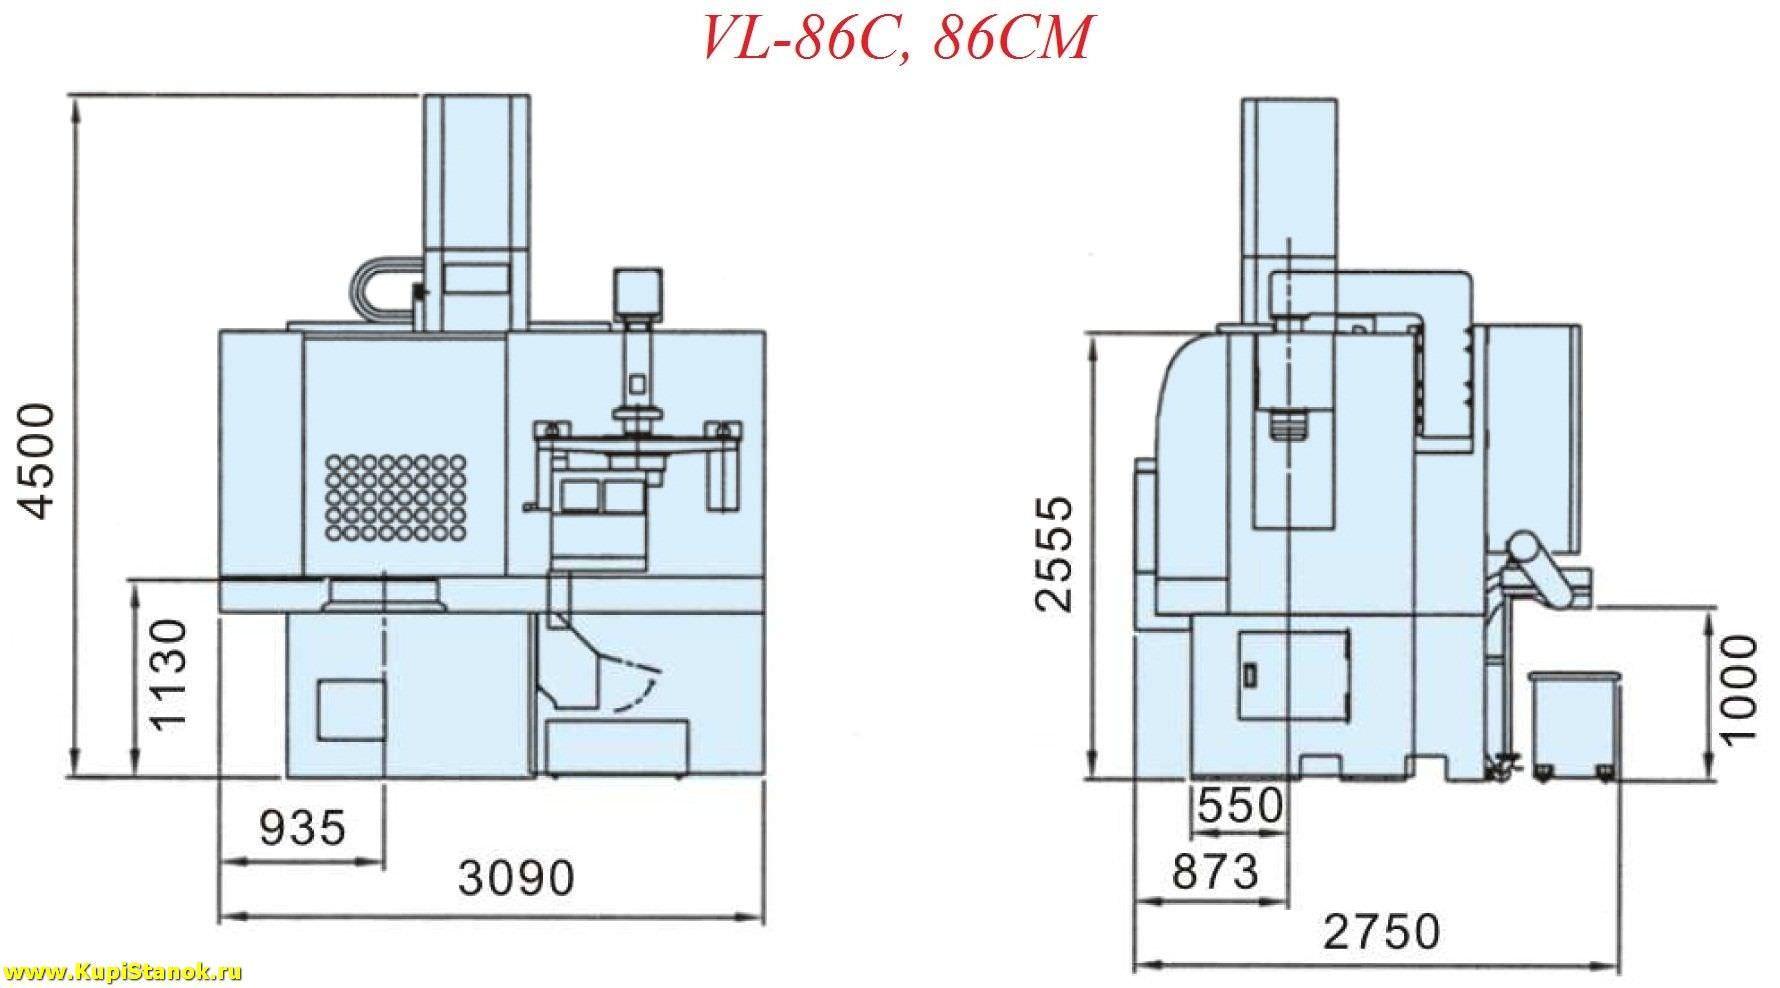 VL-86СM